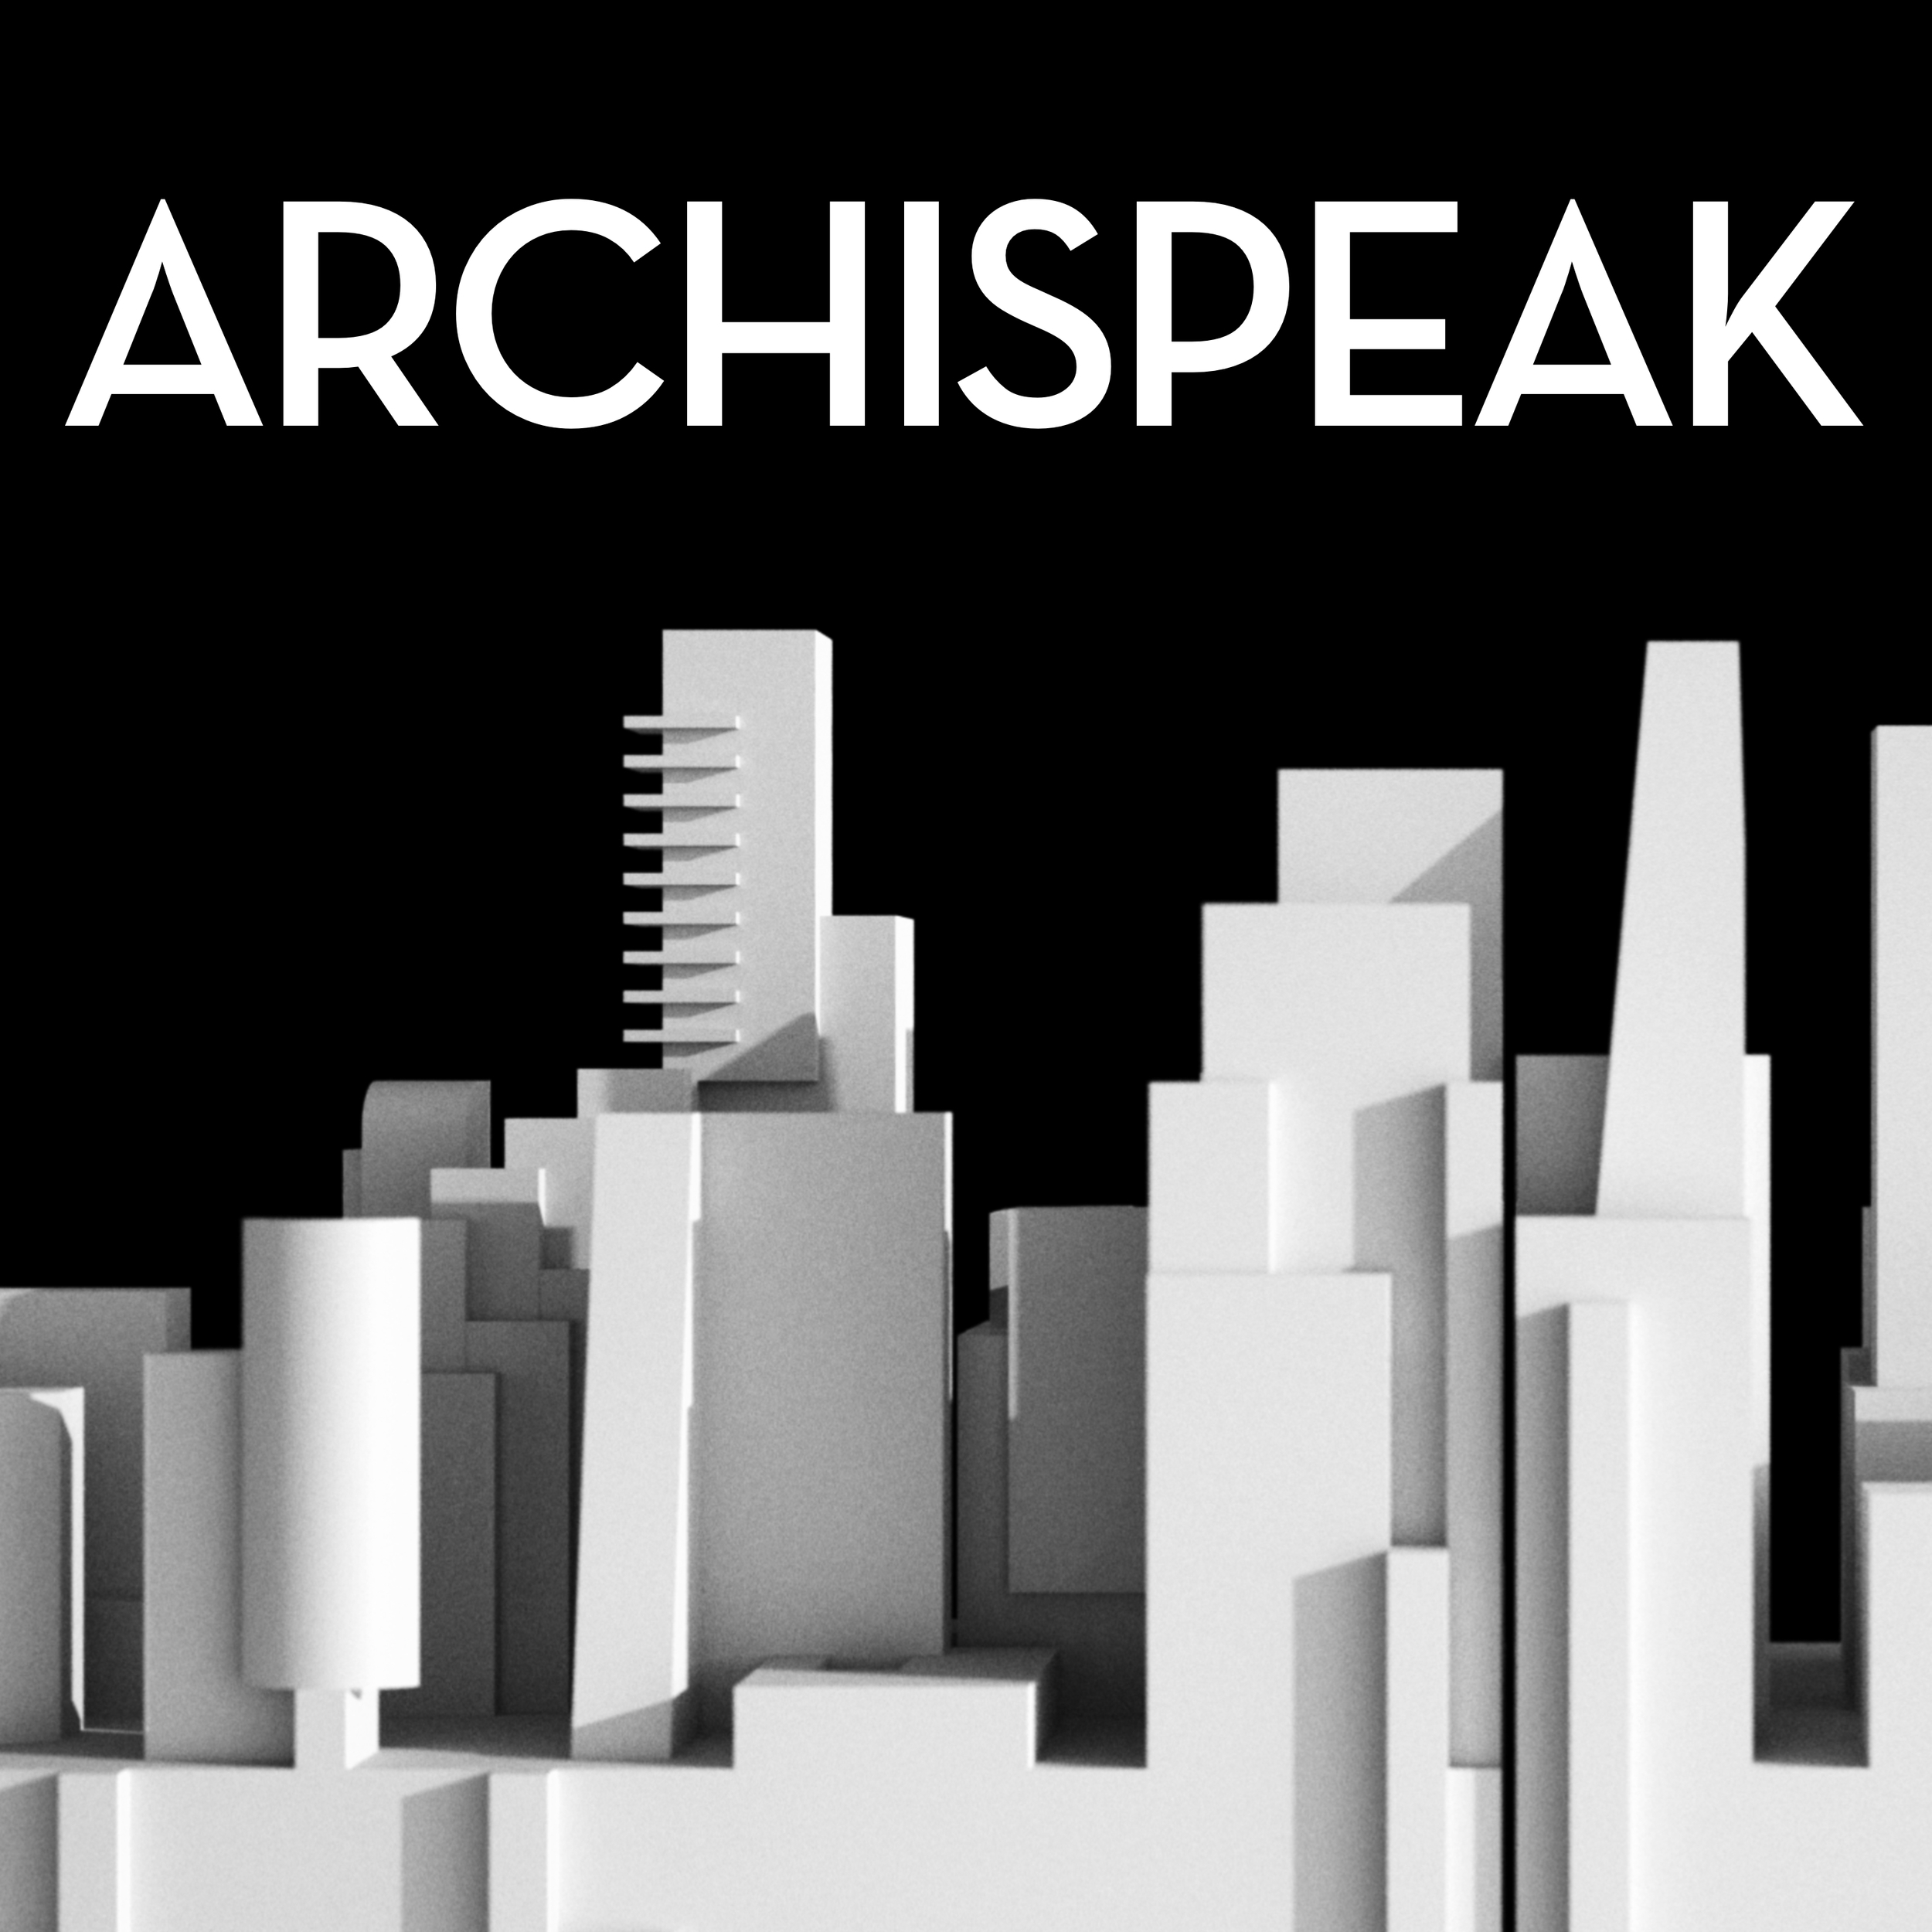 archispeak twitter logo flat neutra.jpg